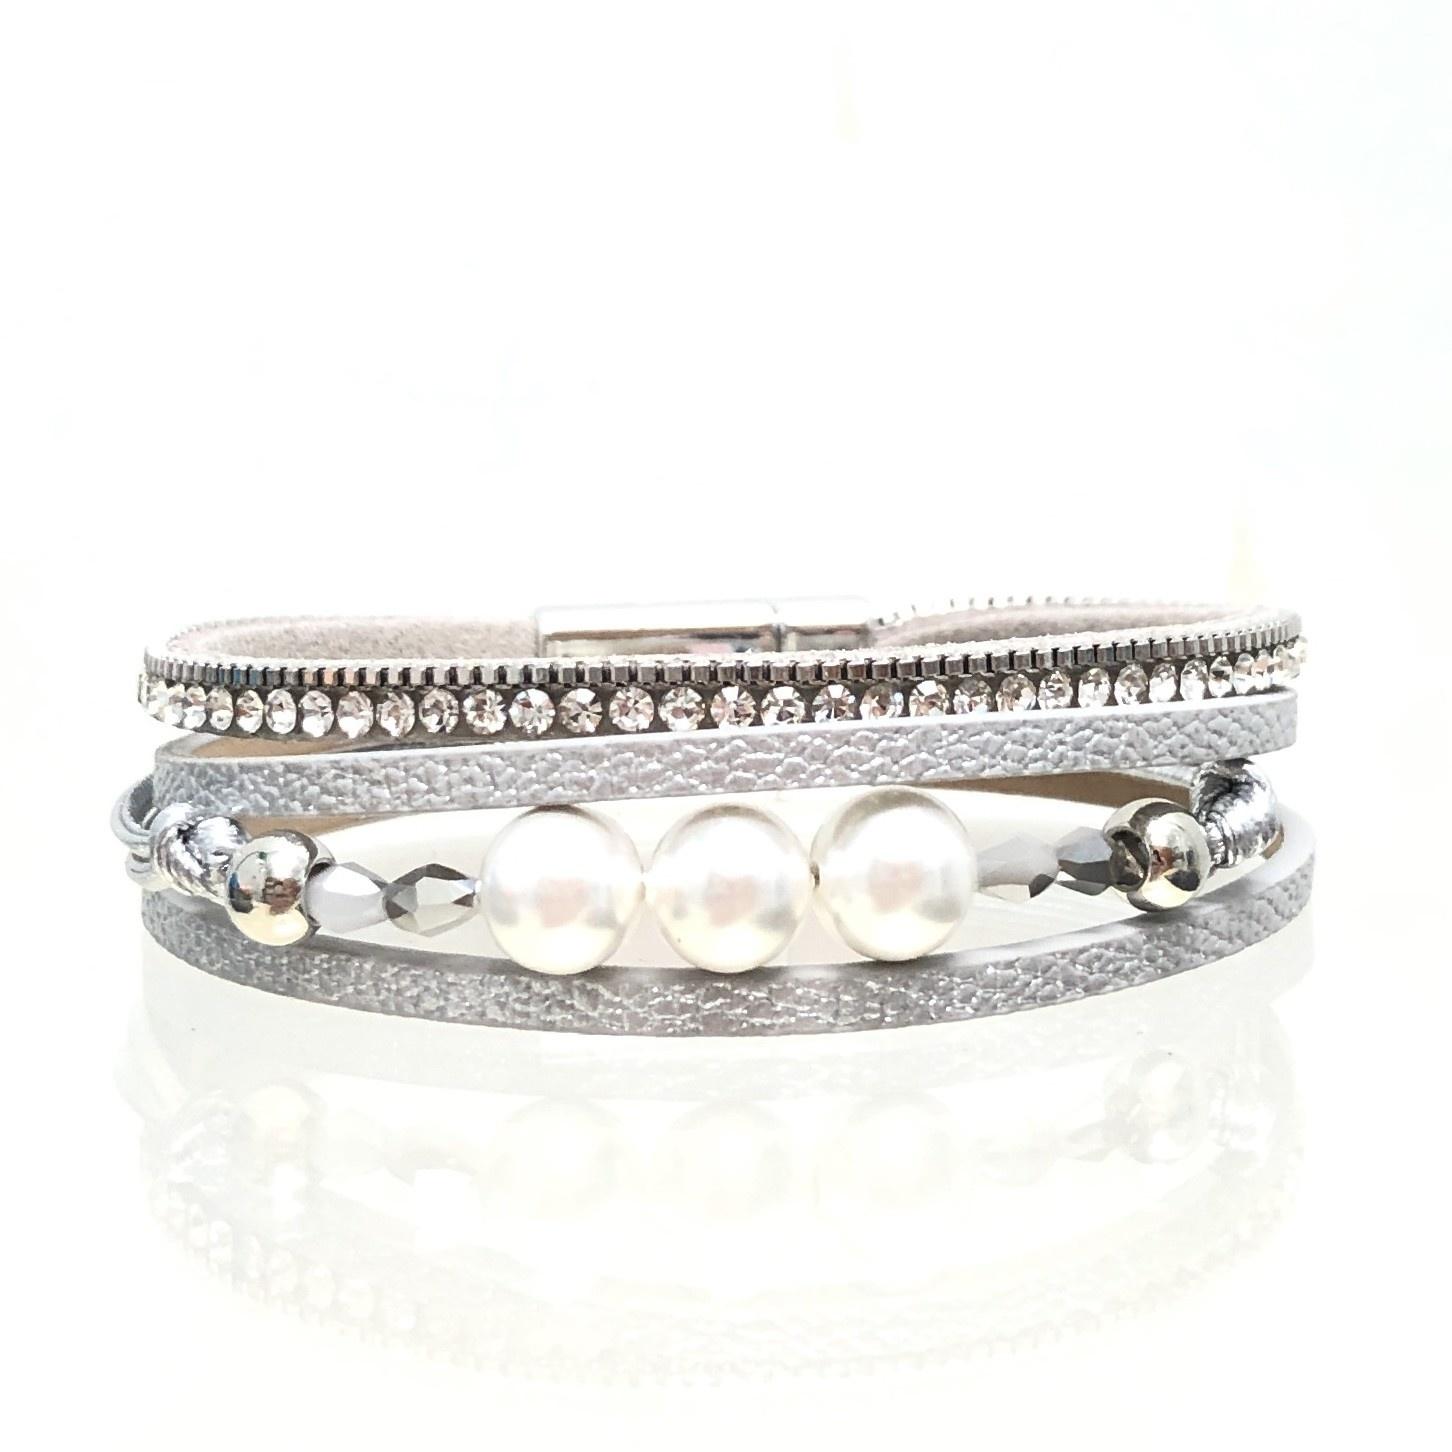 Sunrise USA Trading Silver Narrow Pearl/Crystal Bracelet